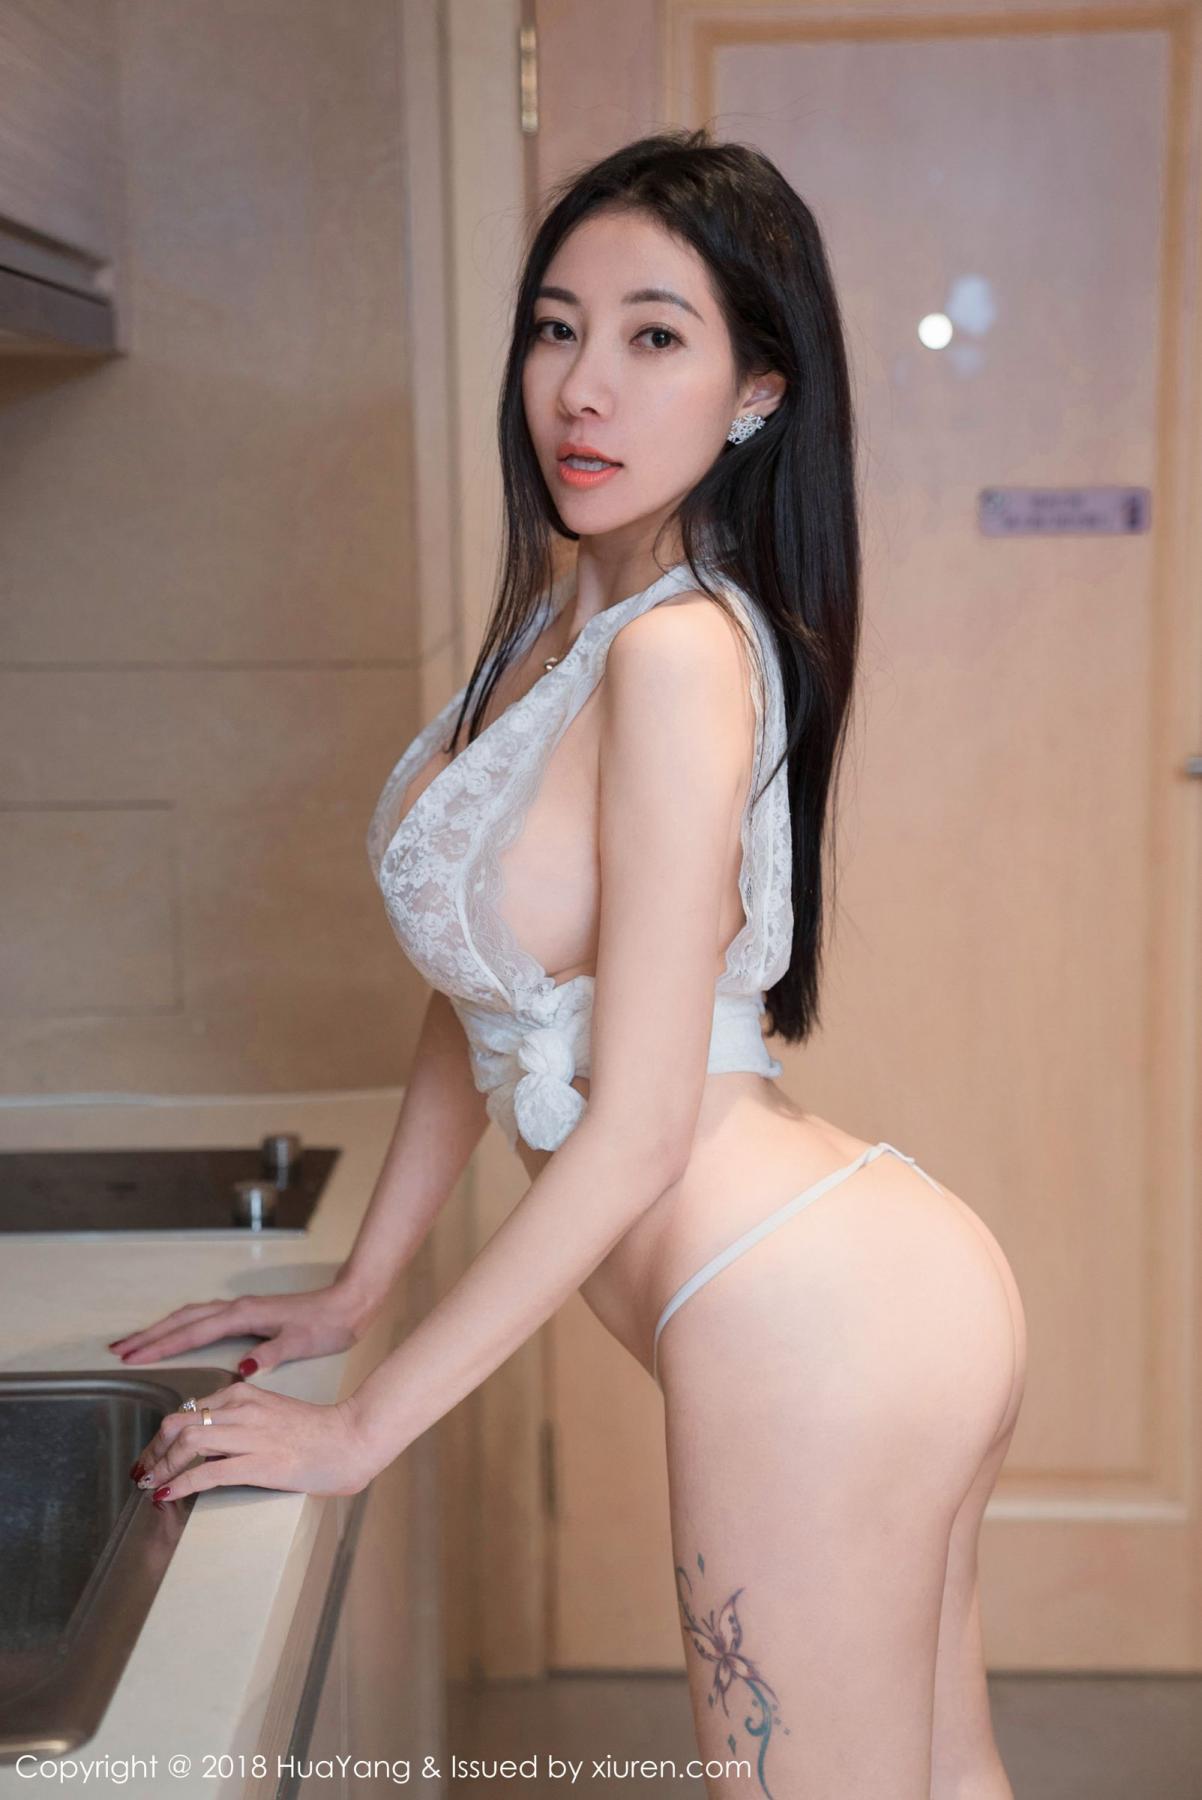 [Huayang] Vol.090 Song Guo Er 30P, HuaYang, Song Guo Er, Underwear